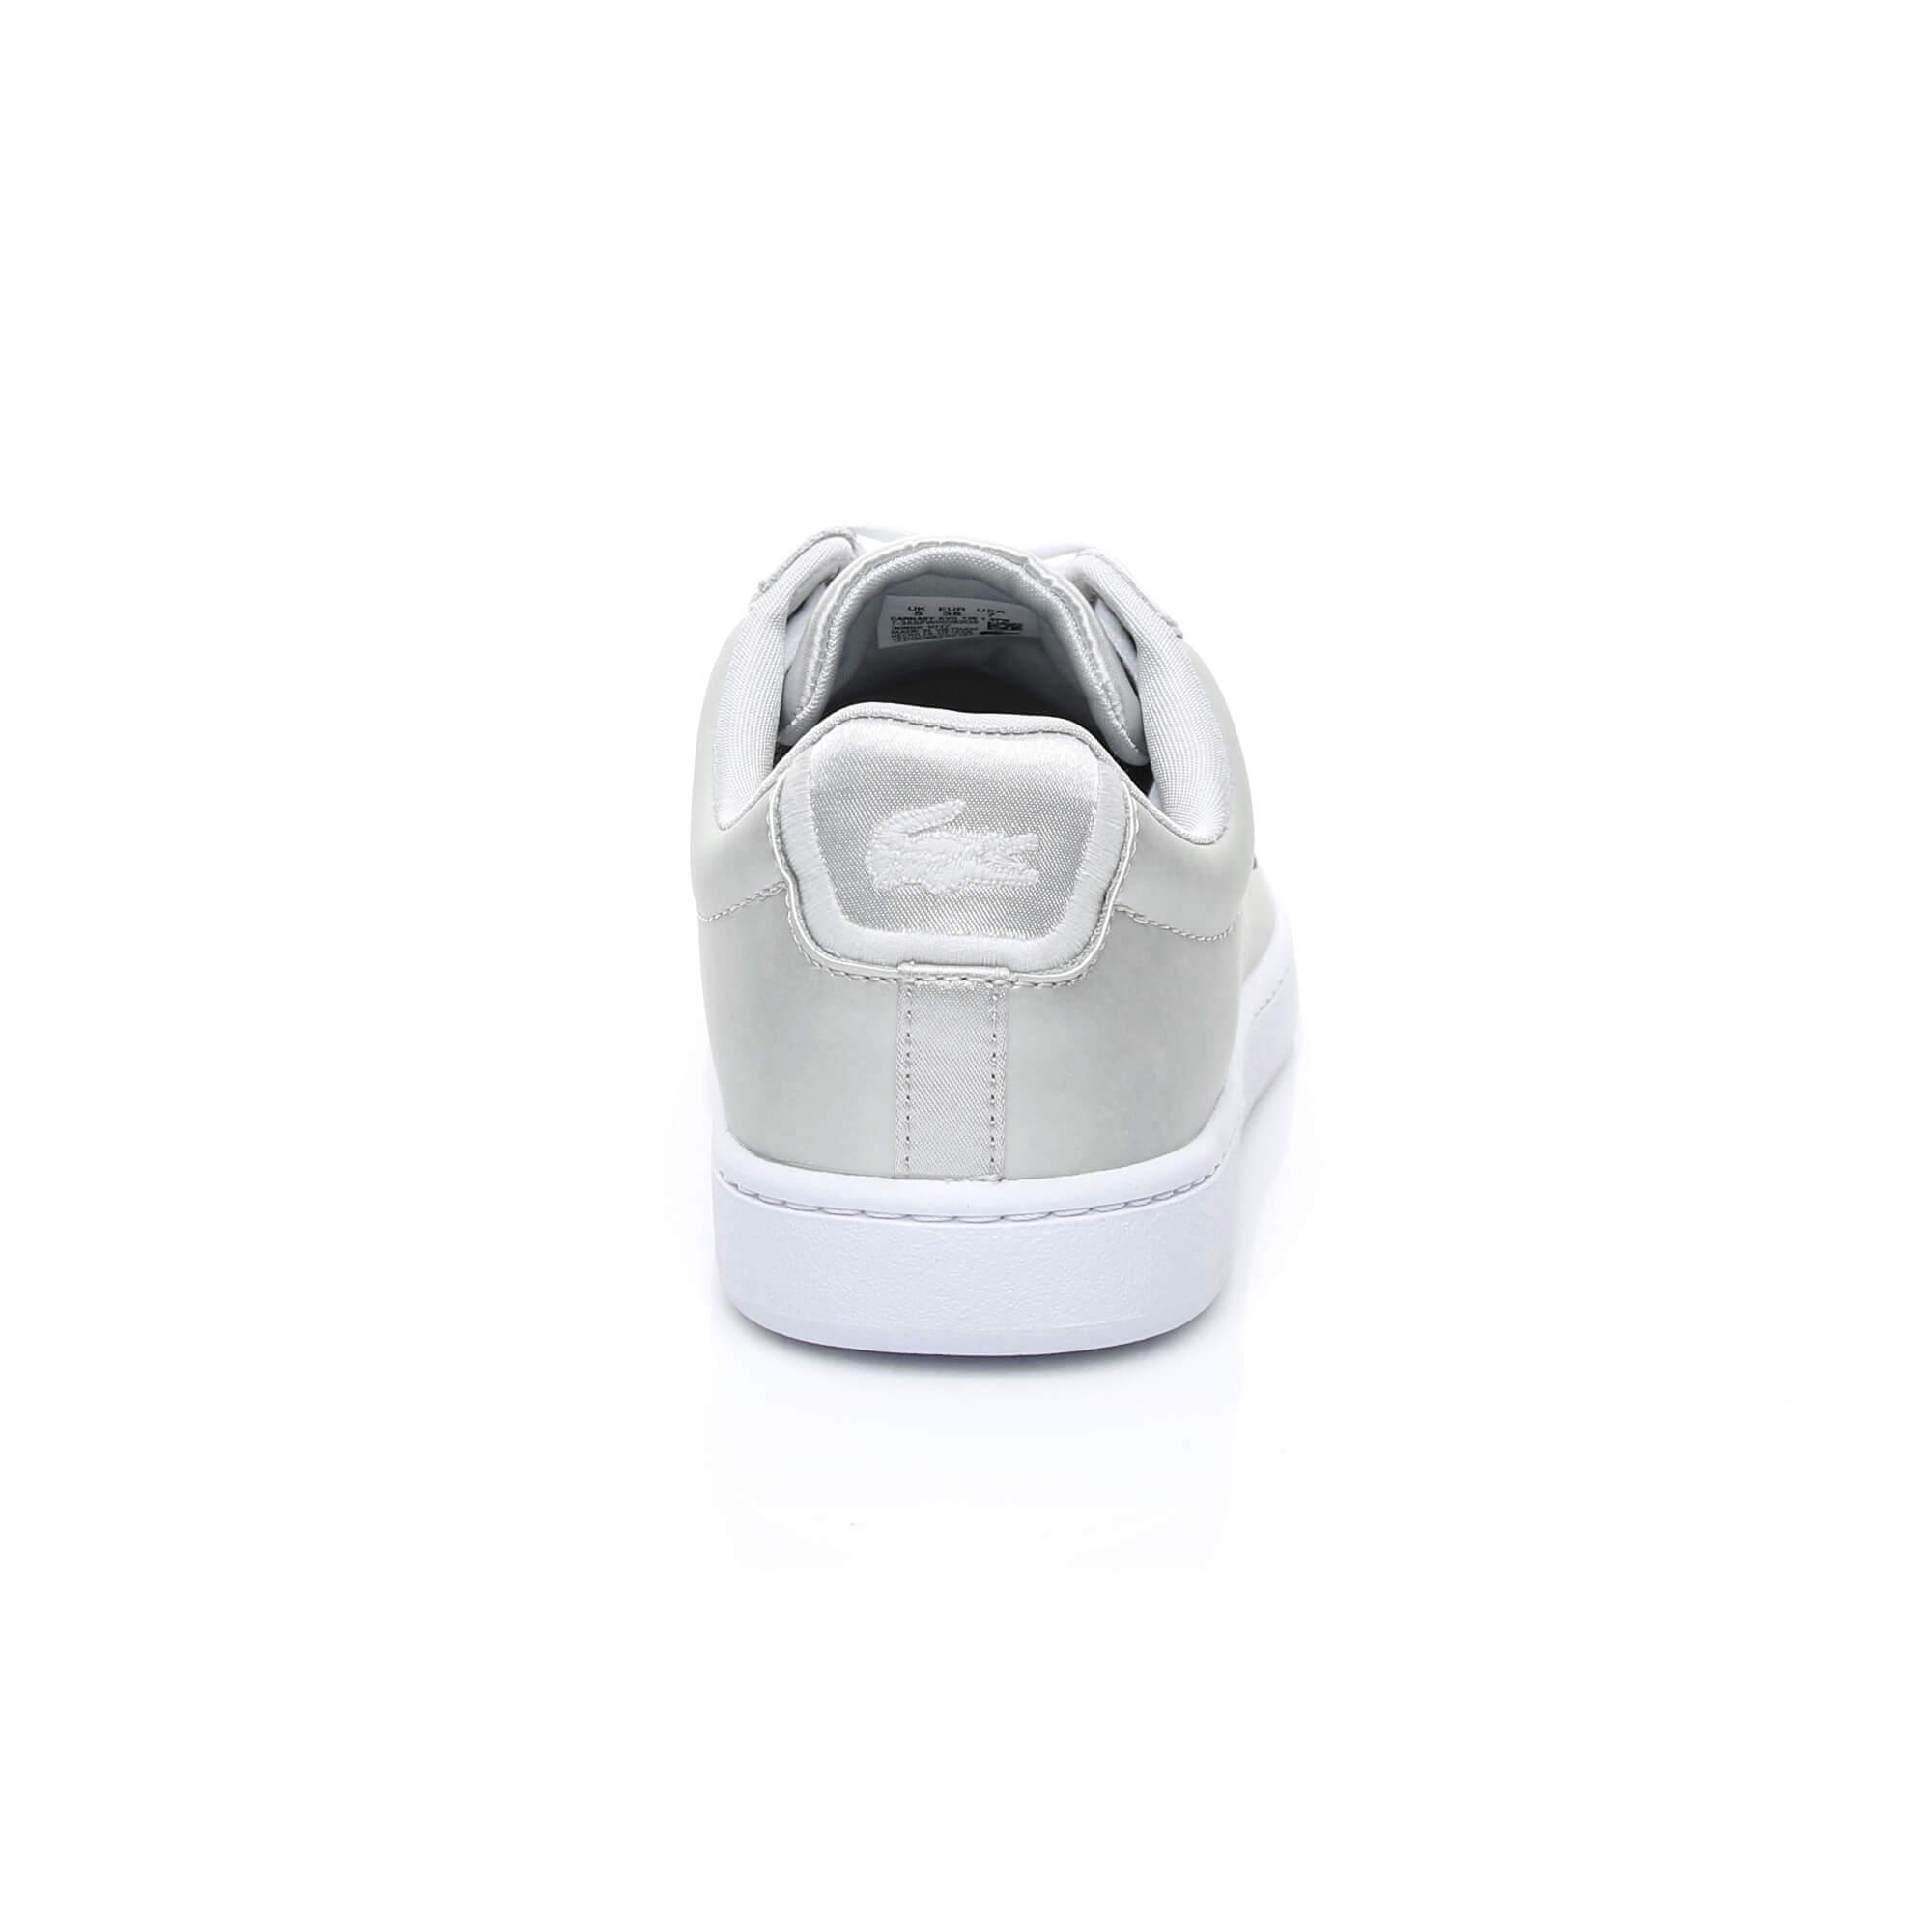 Lacoste Carnaby Evo 118 1 Damskie Sneakersy